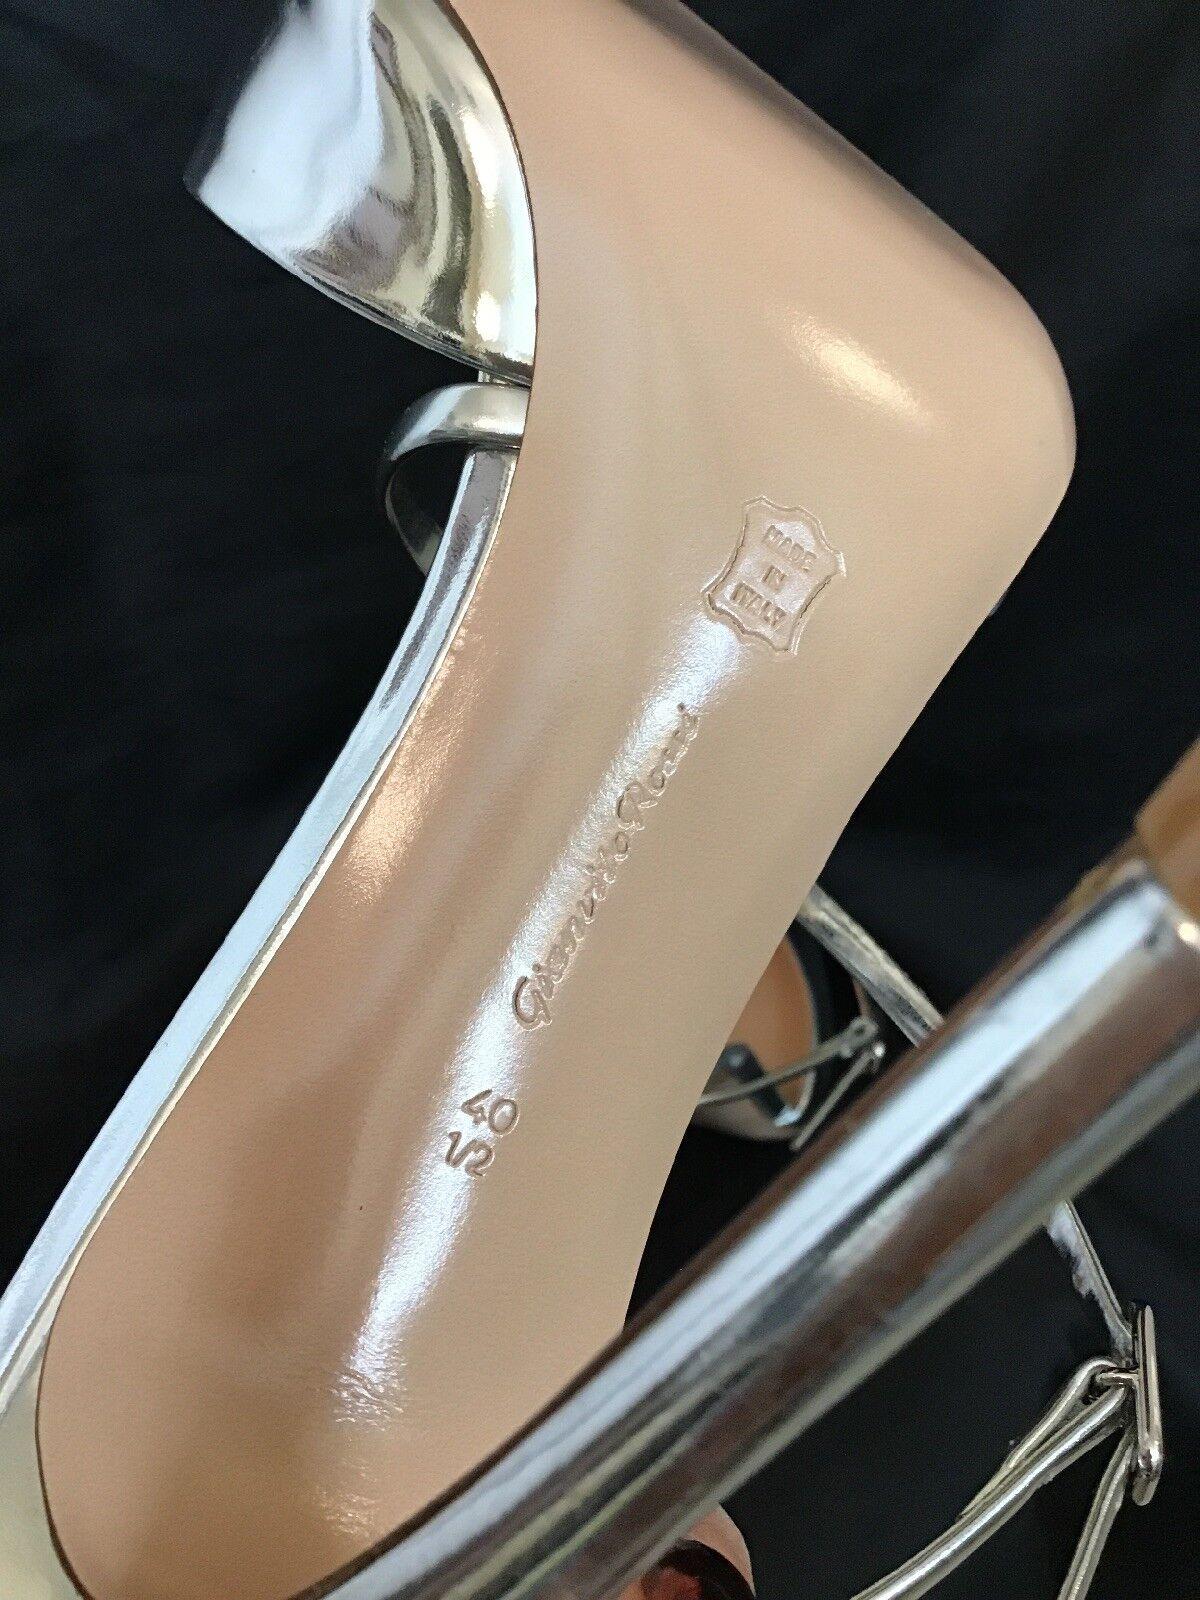 GIANVITO ROSSI ROSSI ROSSI chaussure Speccio en Cuir Argenté Mule Bout Pointu Taille 40 1 2 NEUF 93c0e7